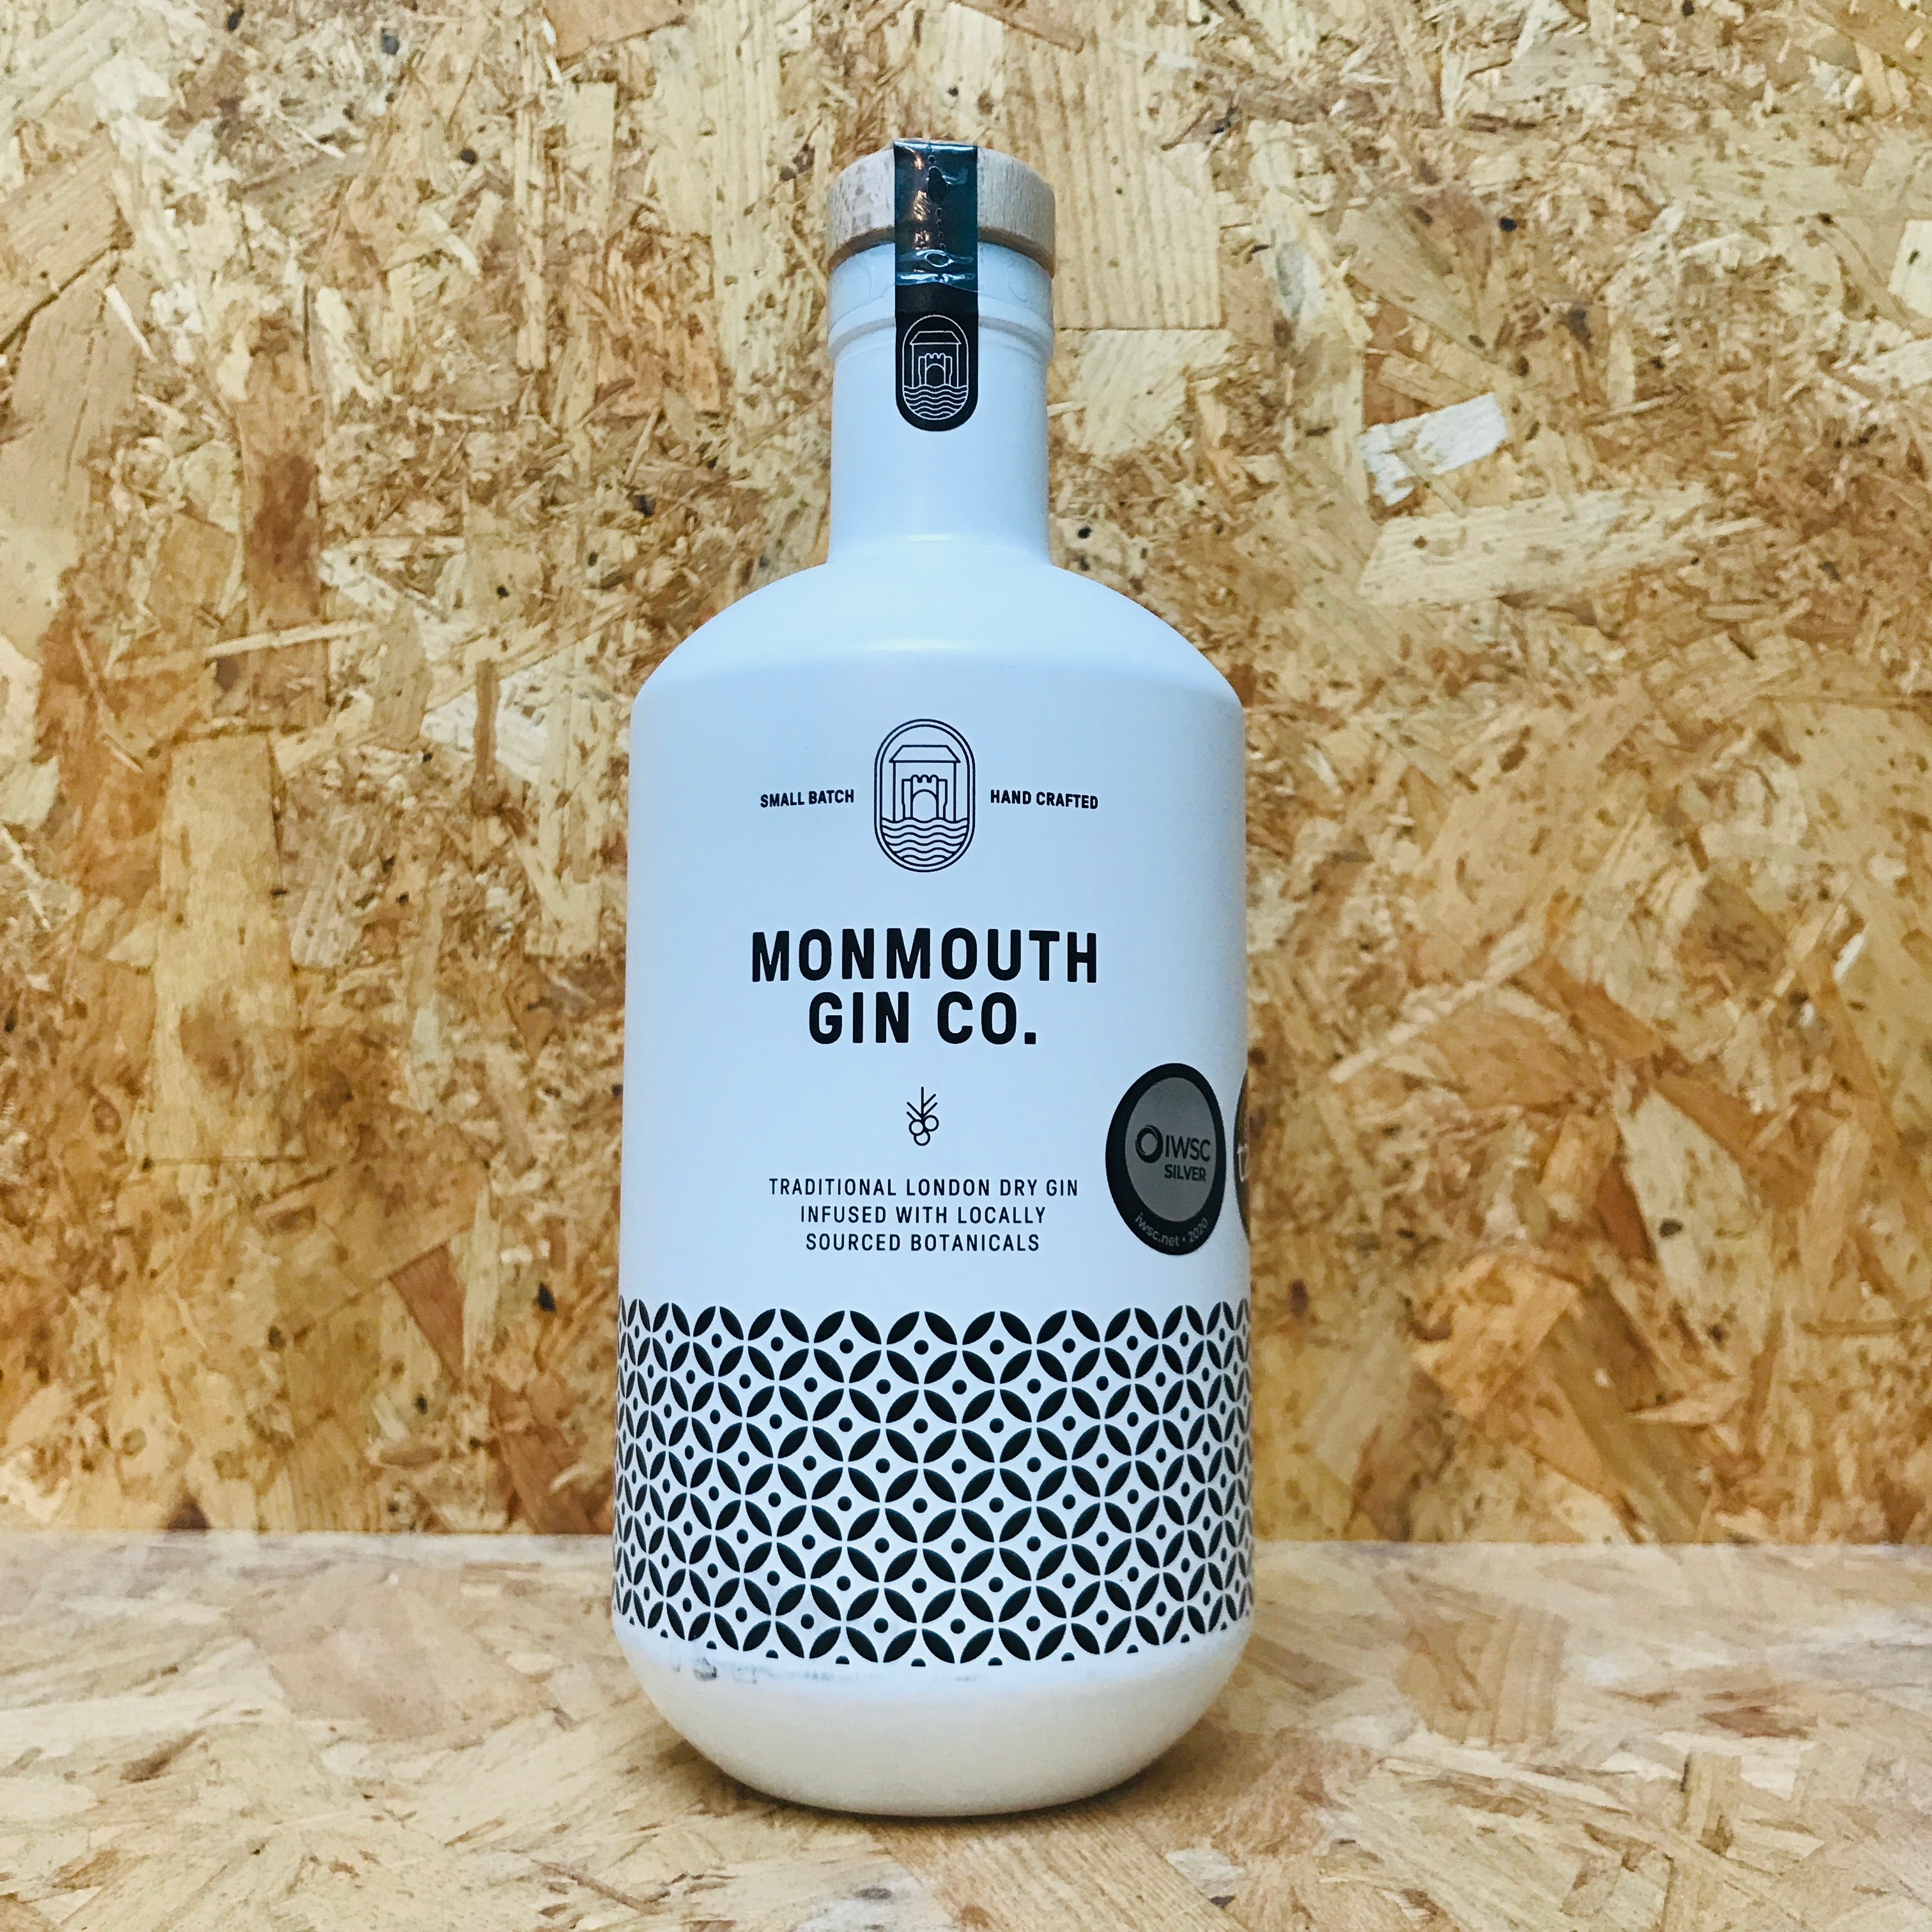 Monmouth Gin